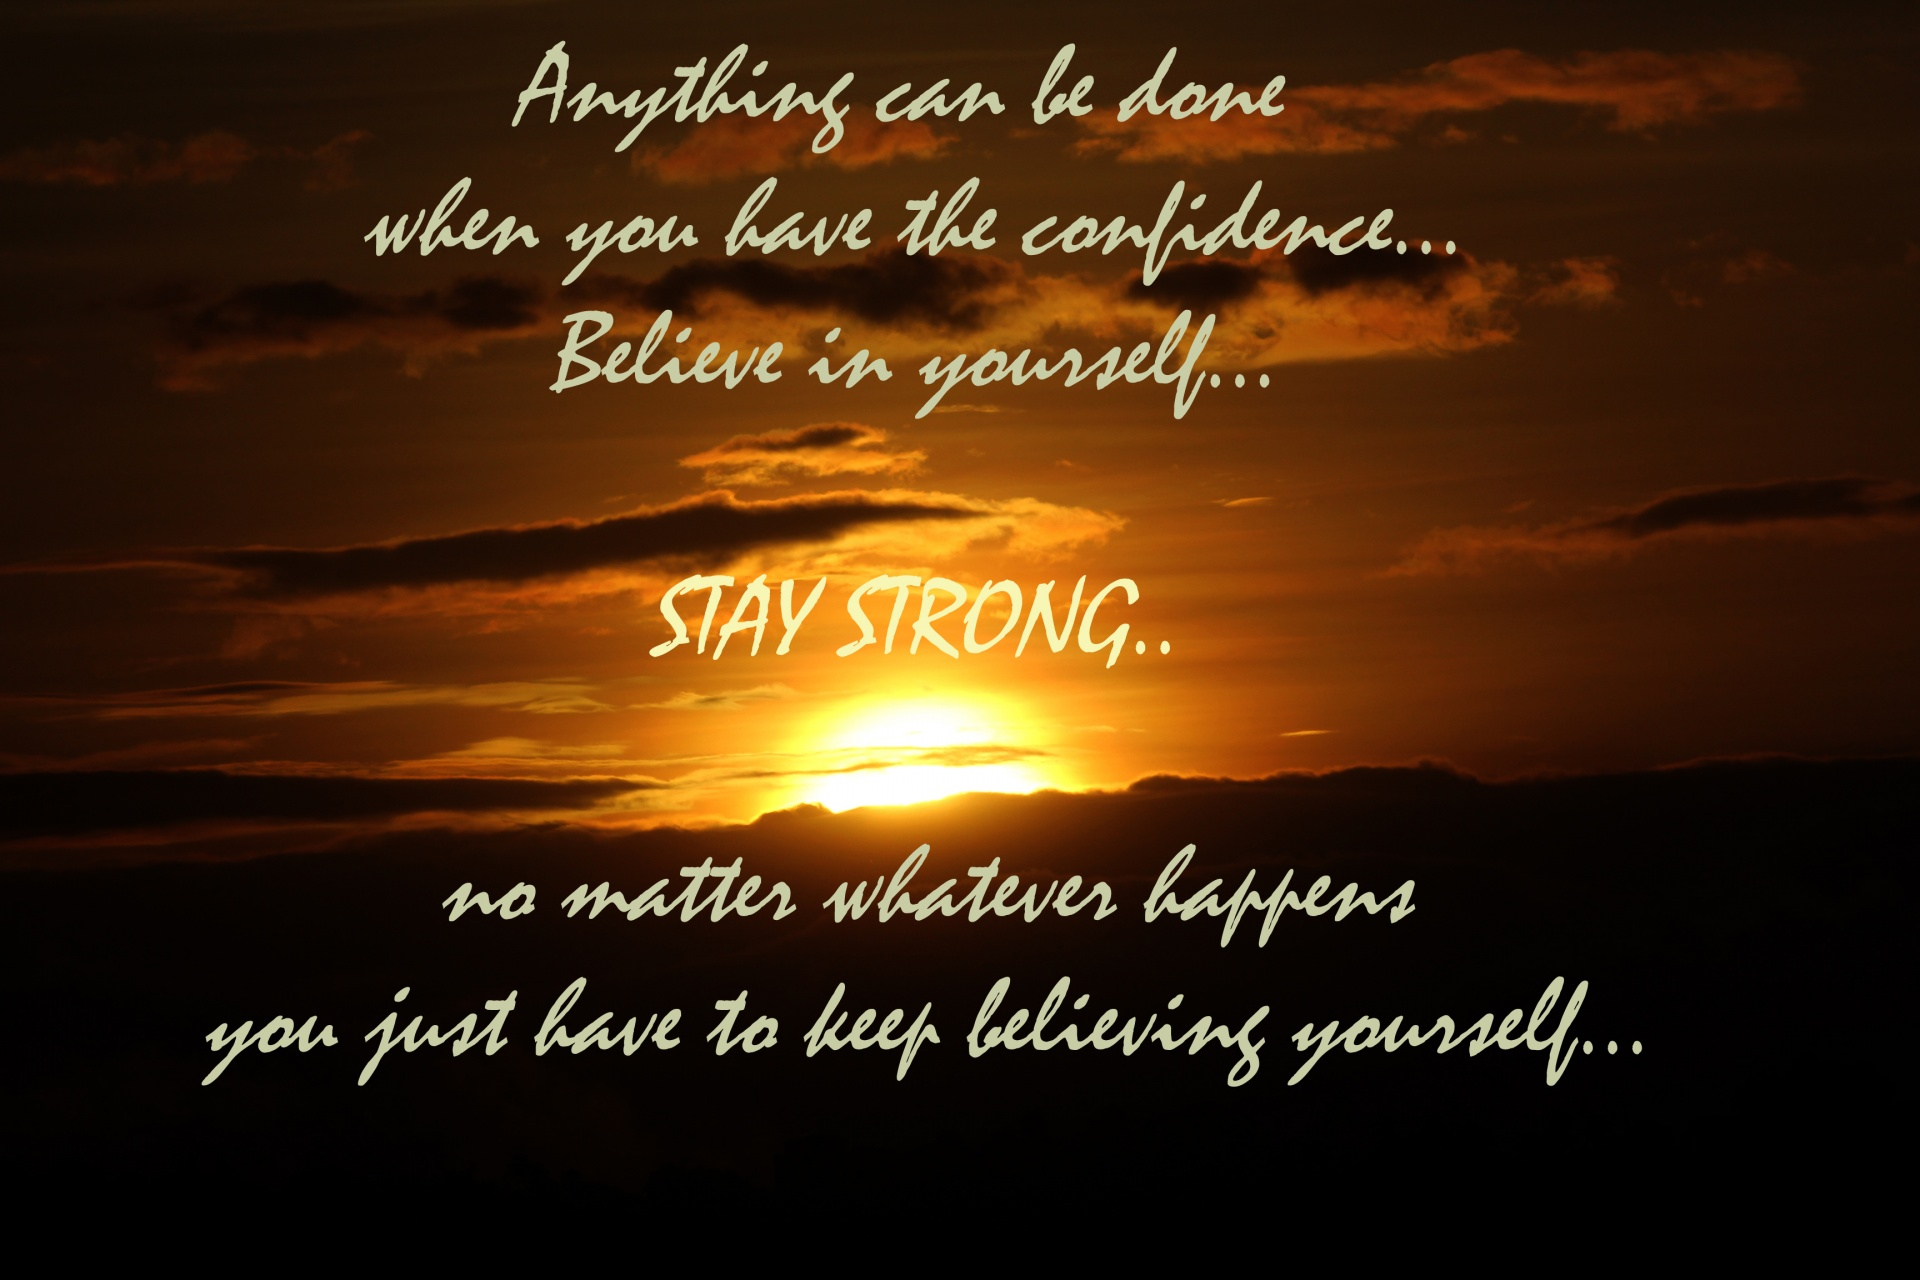 encouragement, strength, positivity, inspiration